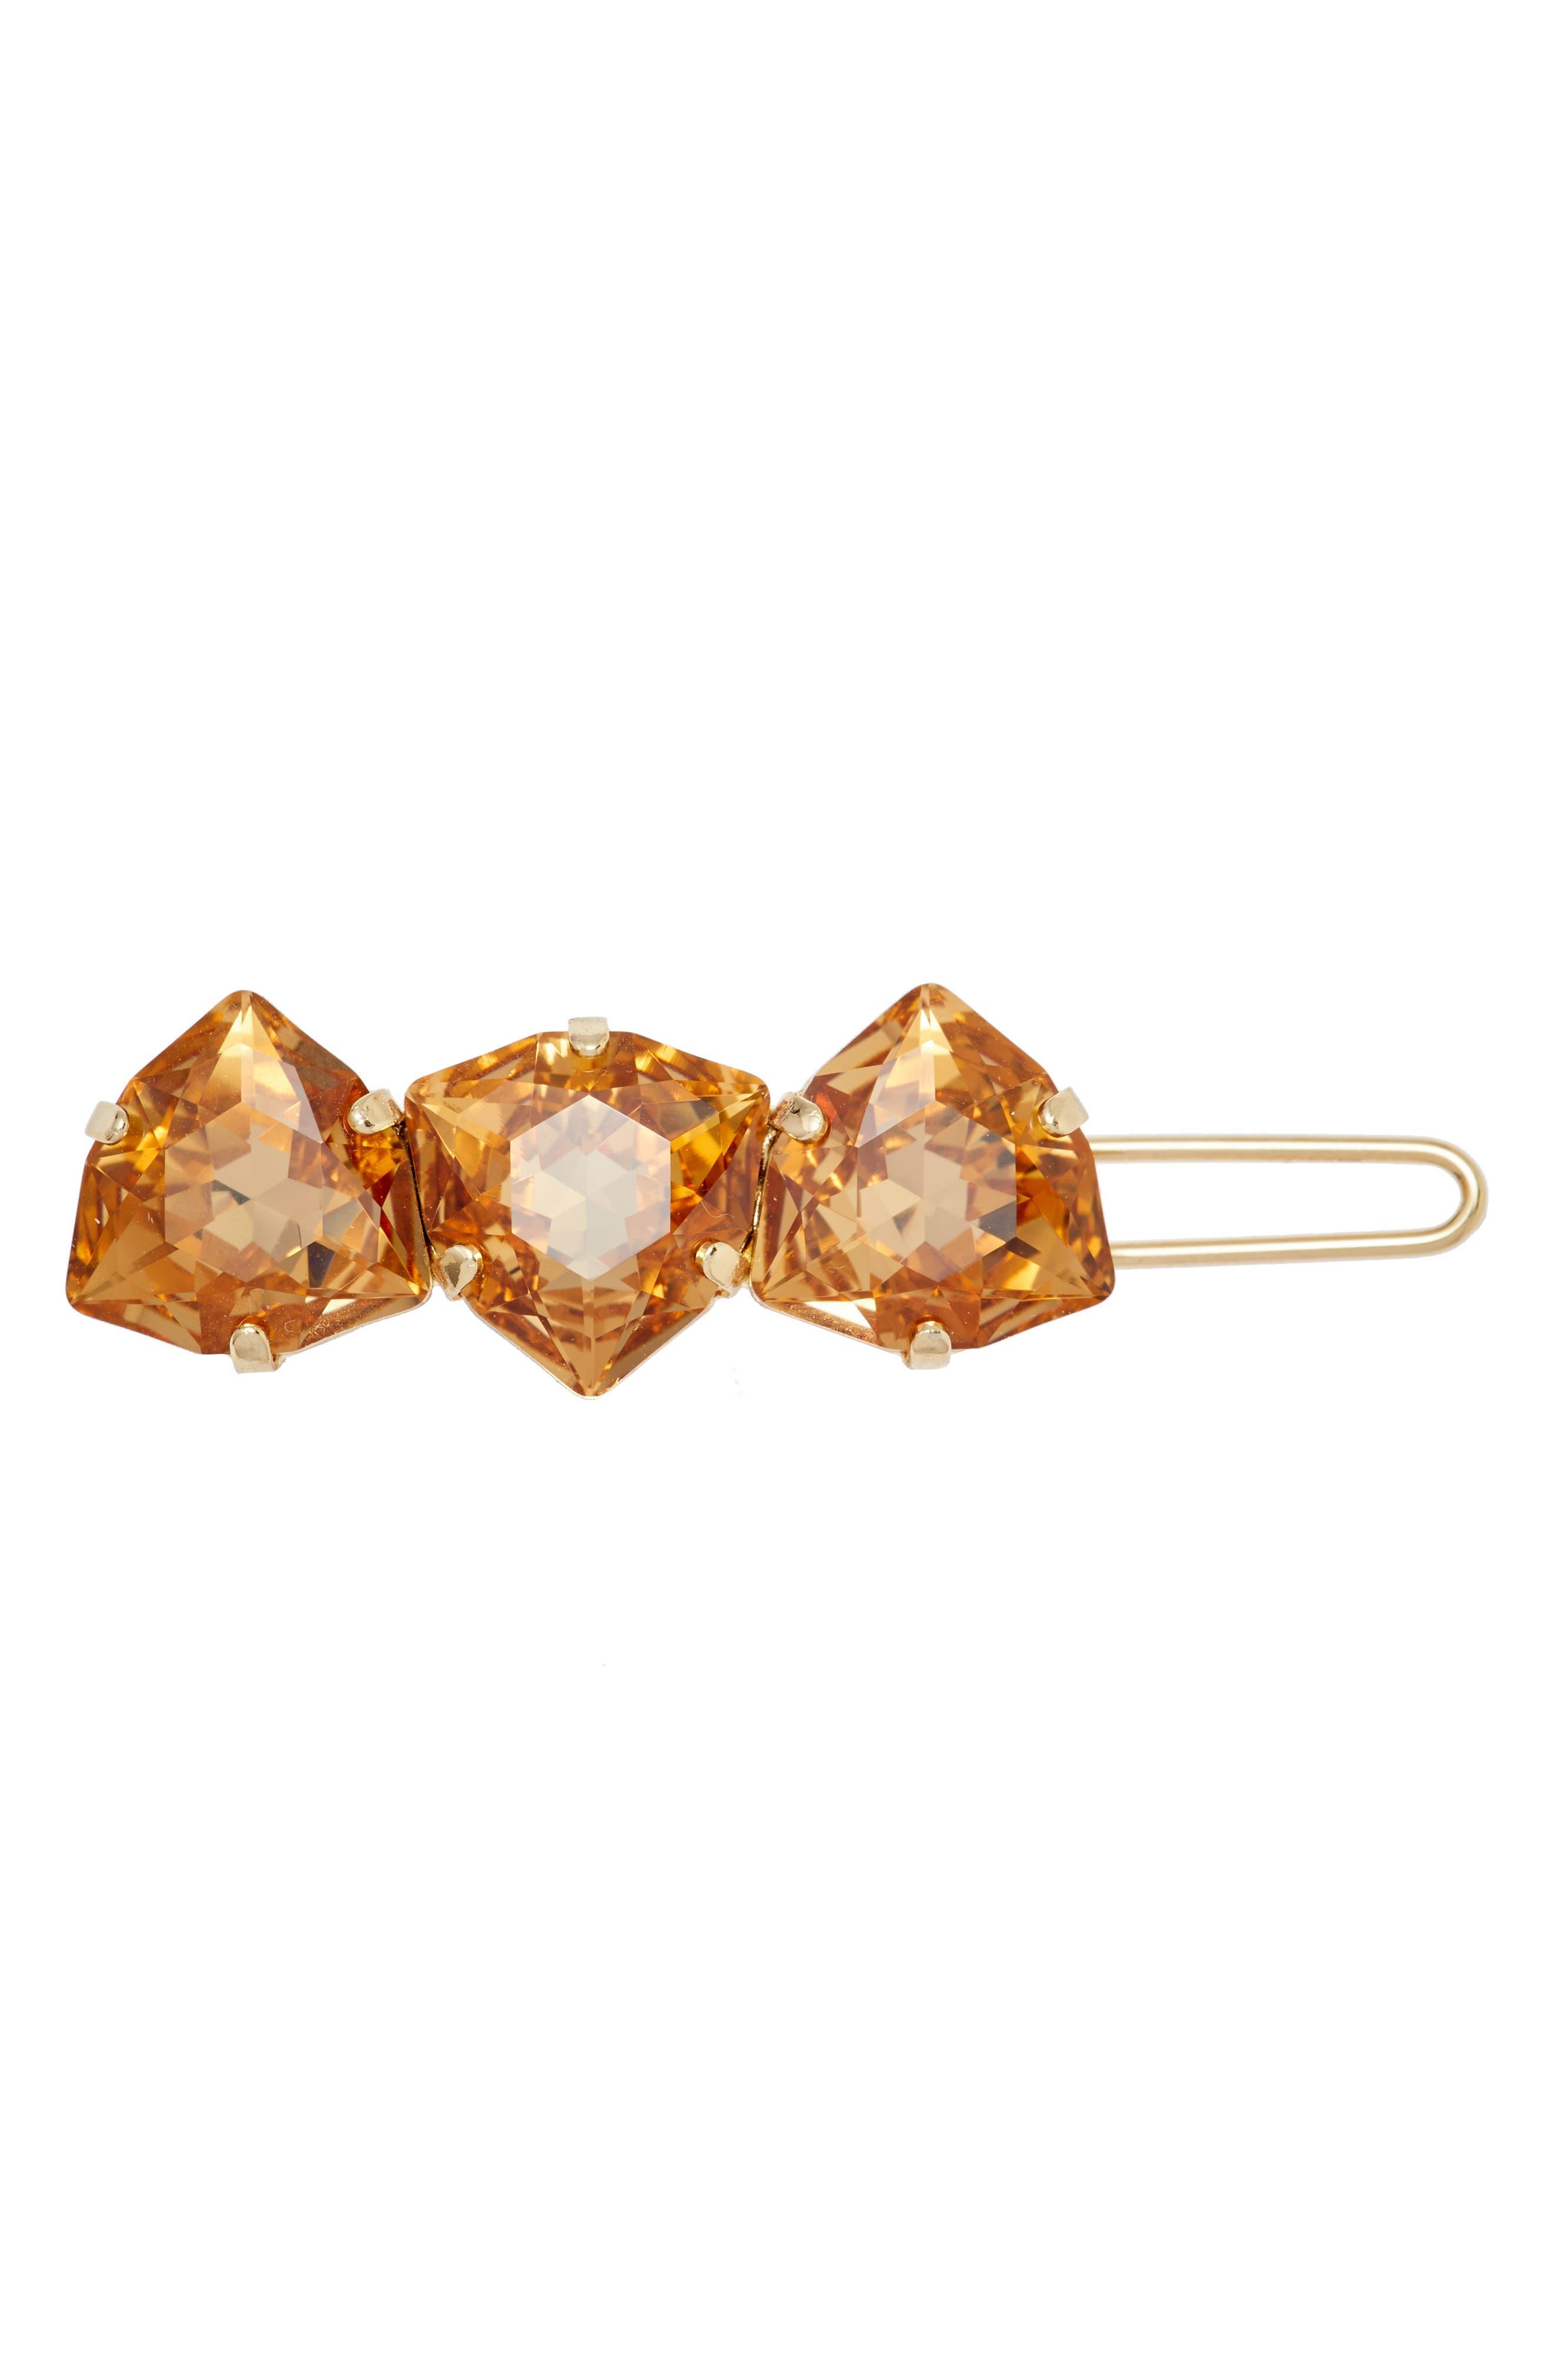 Triple Crystal Tige Boule Barrette,                         Main,                         color, Light Colorado Topaz/ Gold